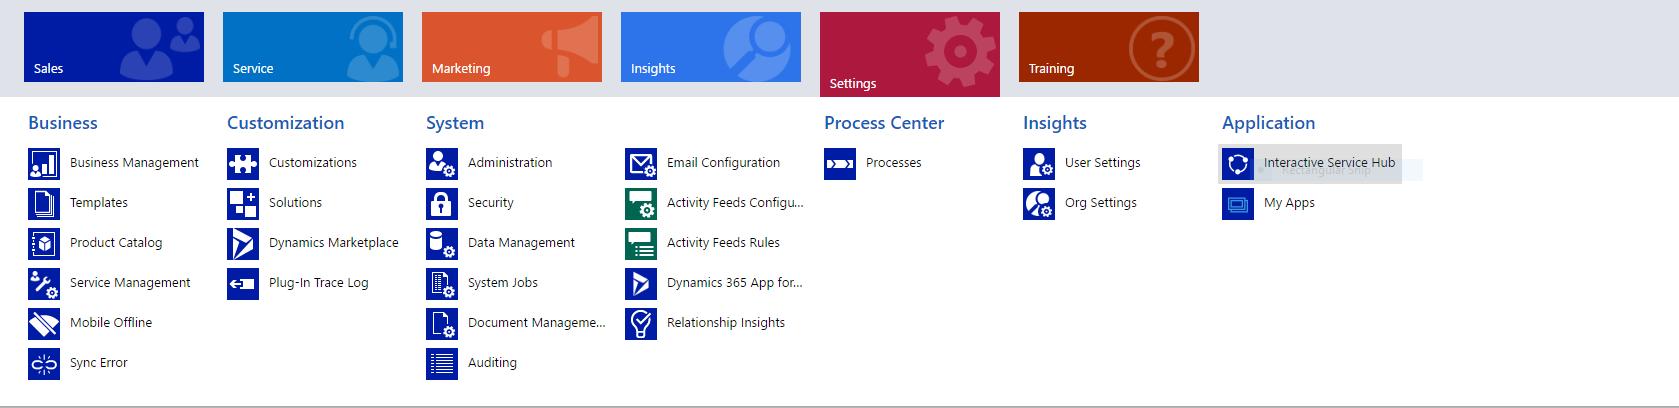 Microsoft Dynamics CRM Ribbon Interactive Service Hub